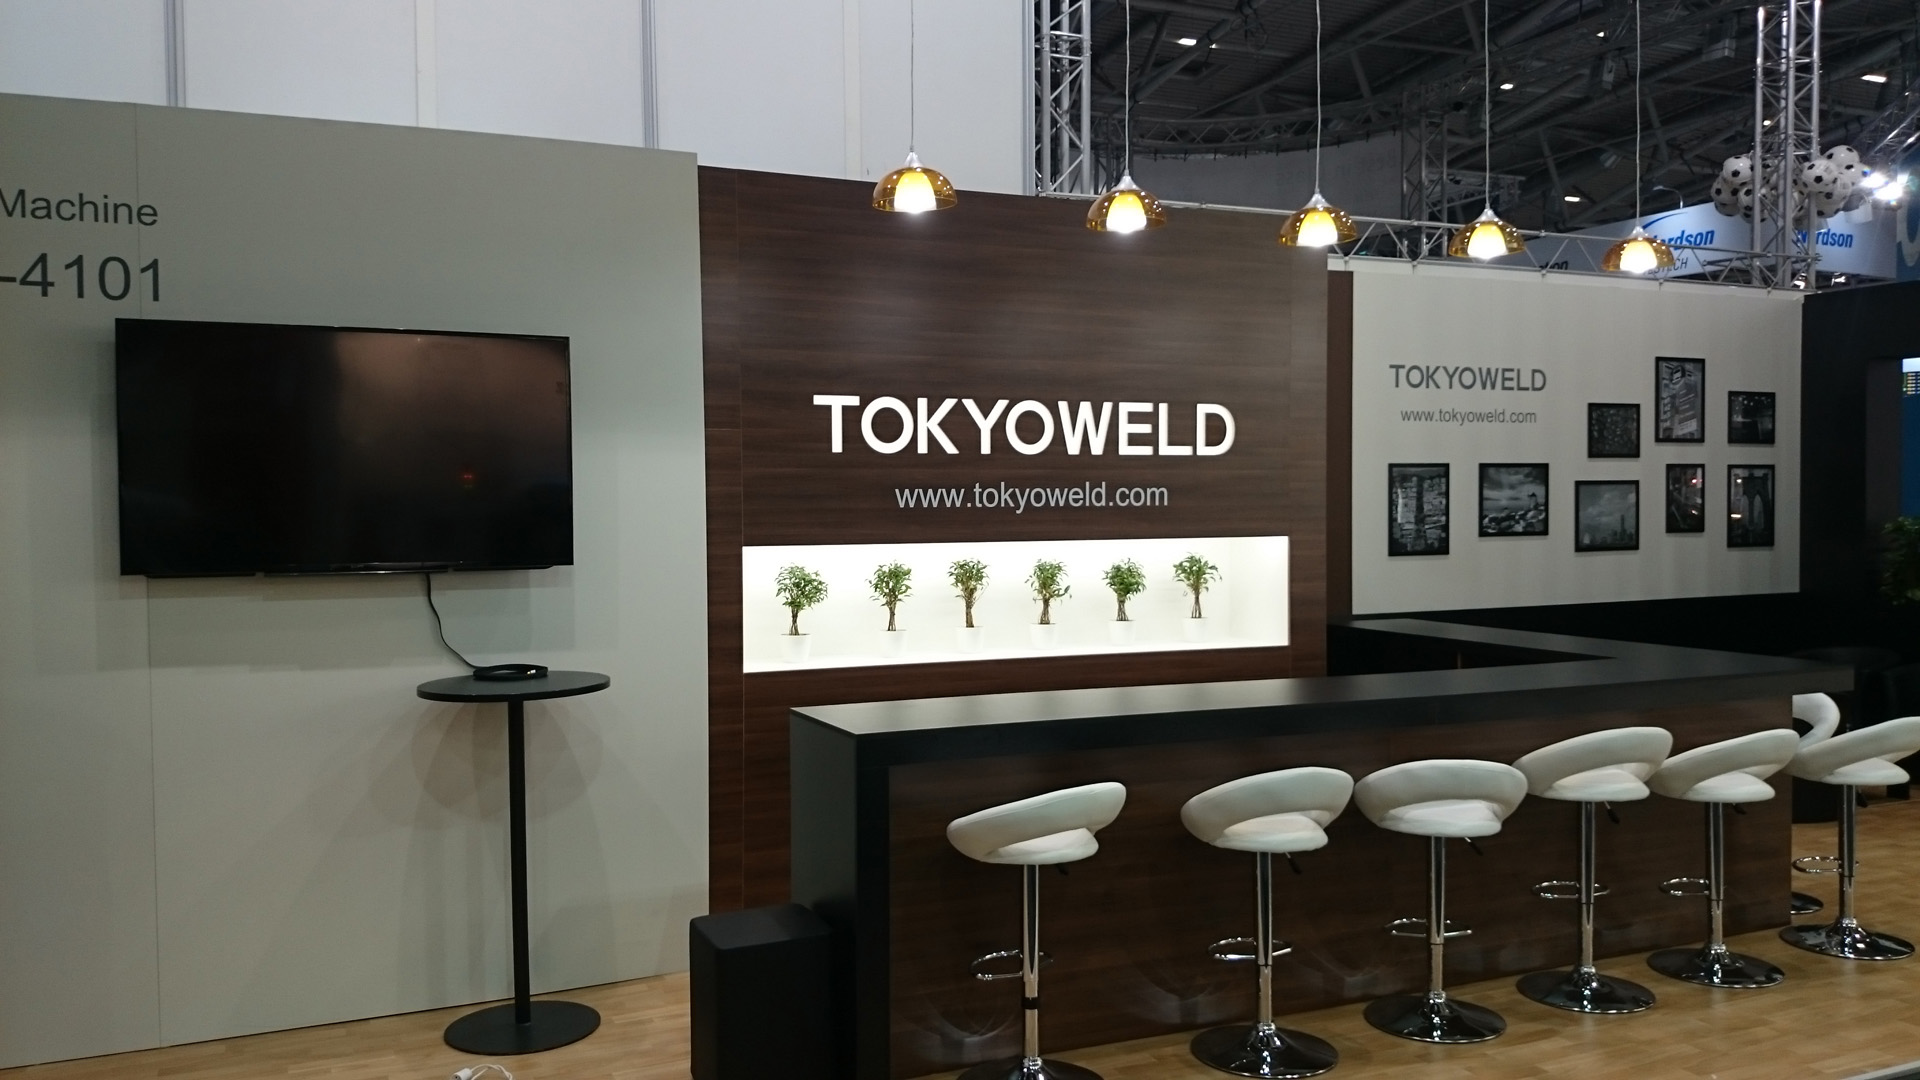 Tokyoweld Productronica Munchen